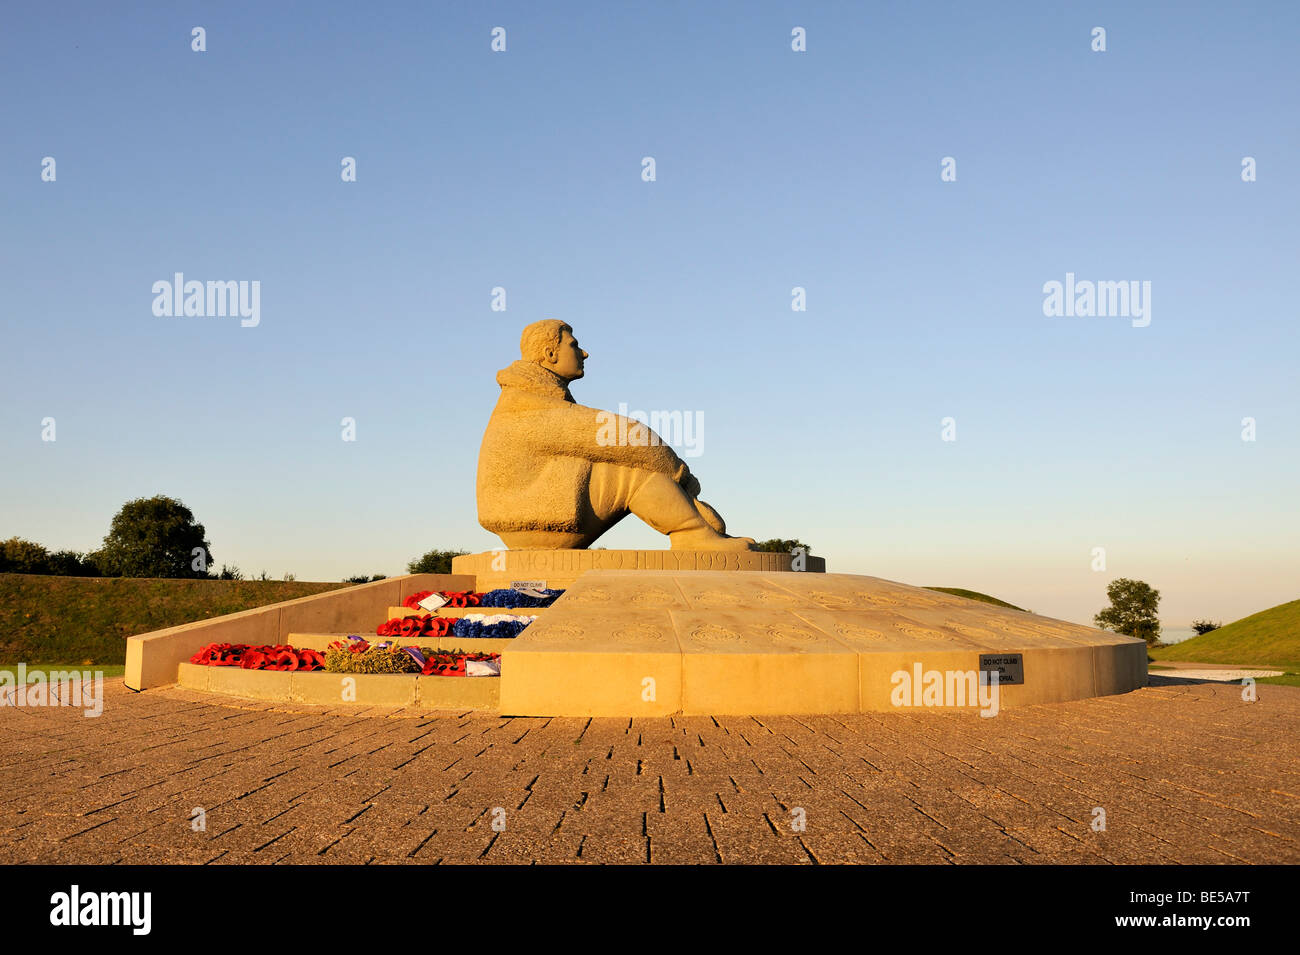 Battle of Britain Memorial at West Malling, Kent, England, UK, Europe Stock Photo